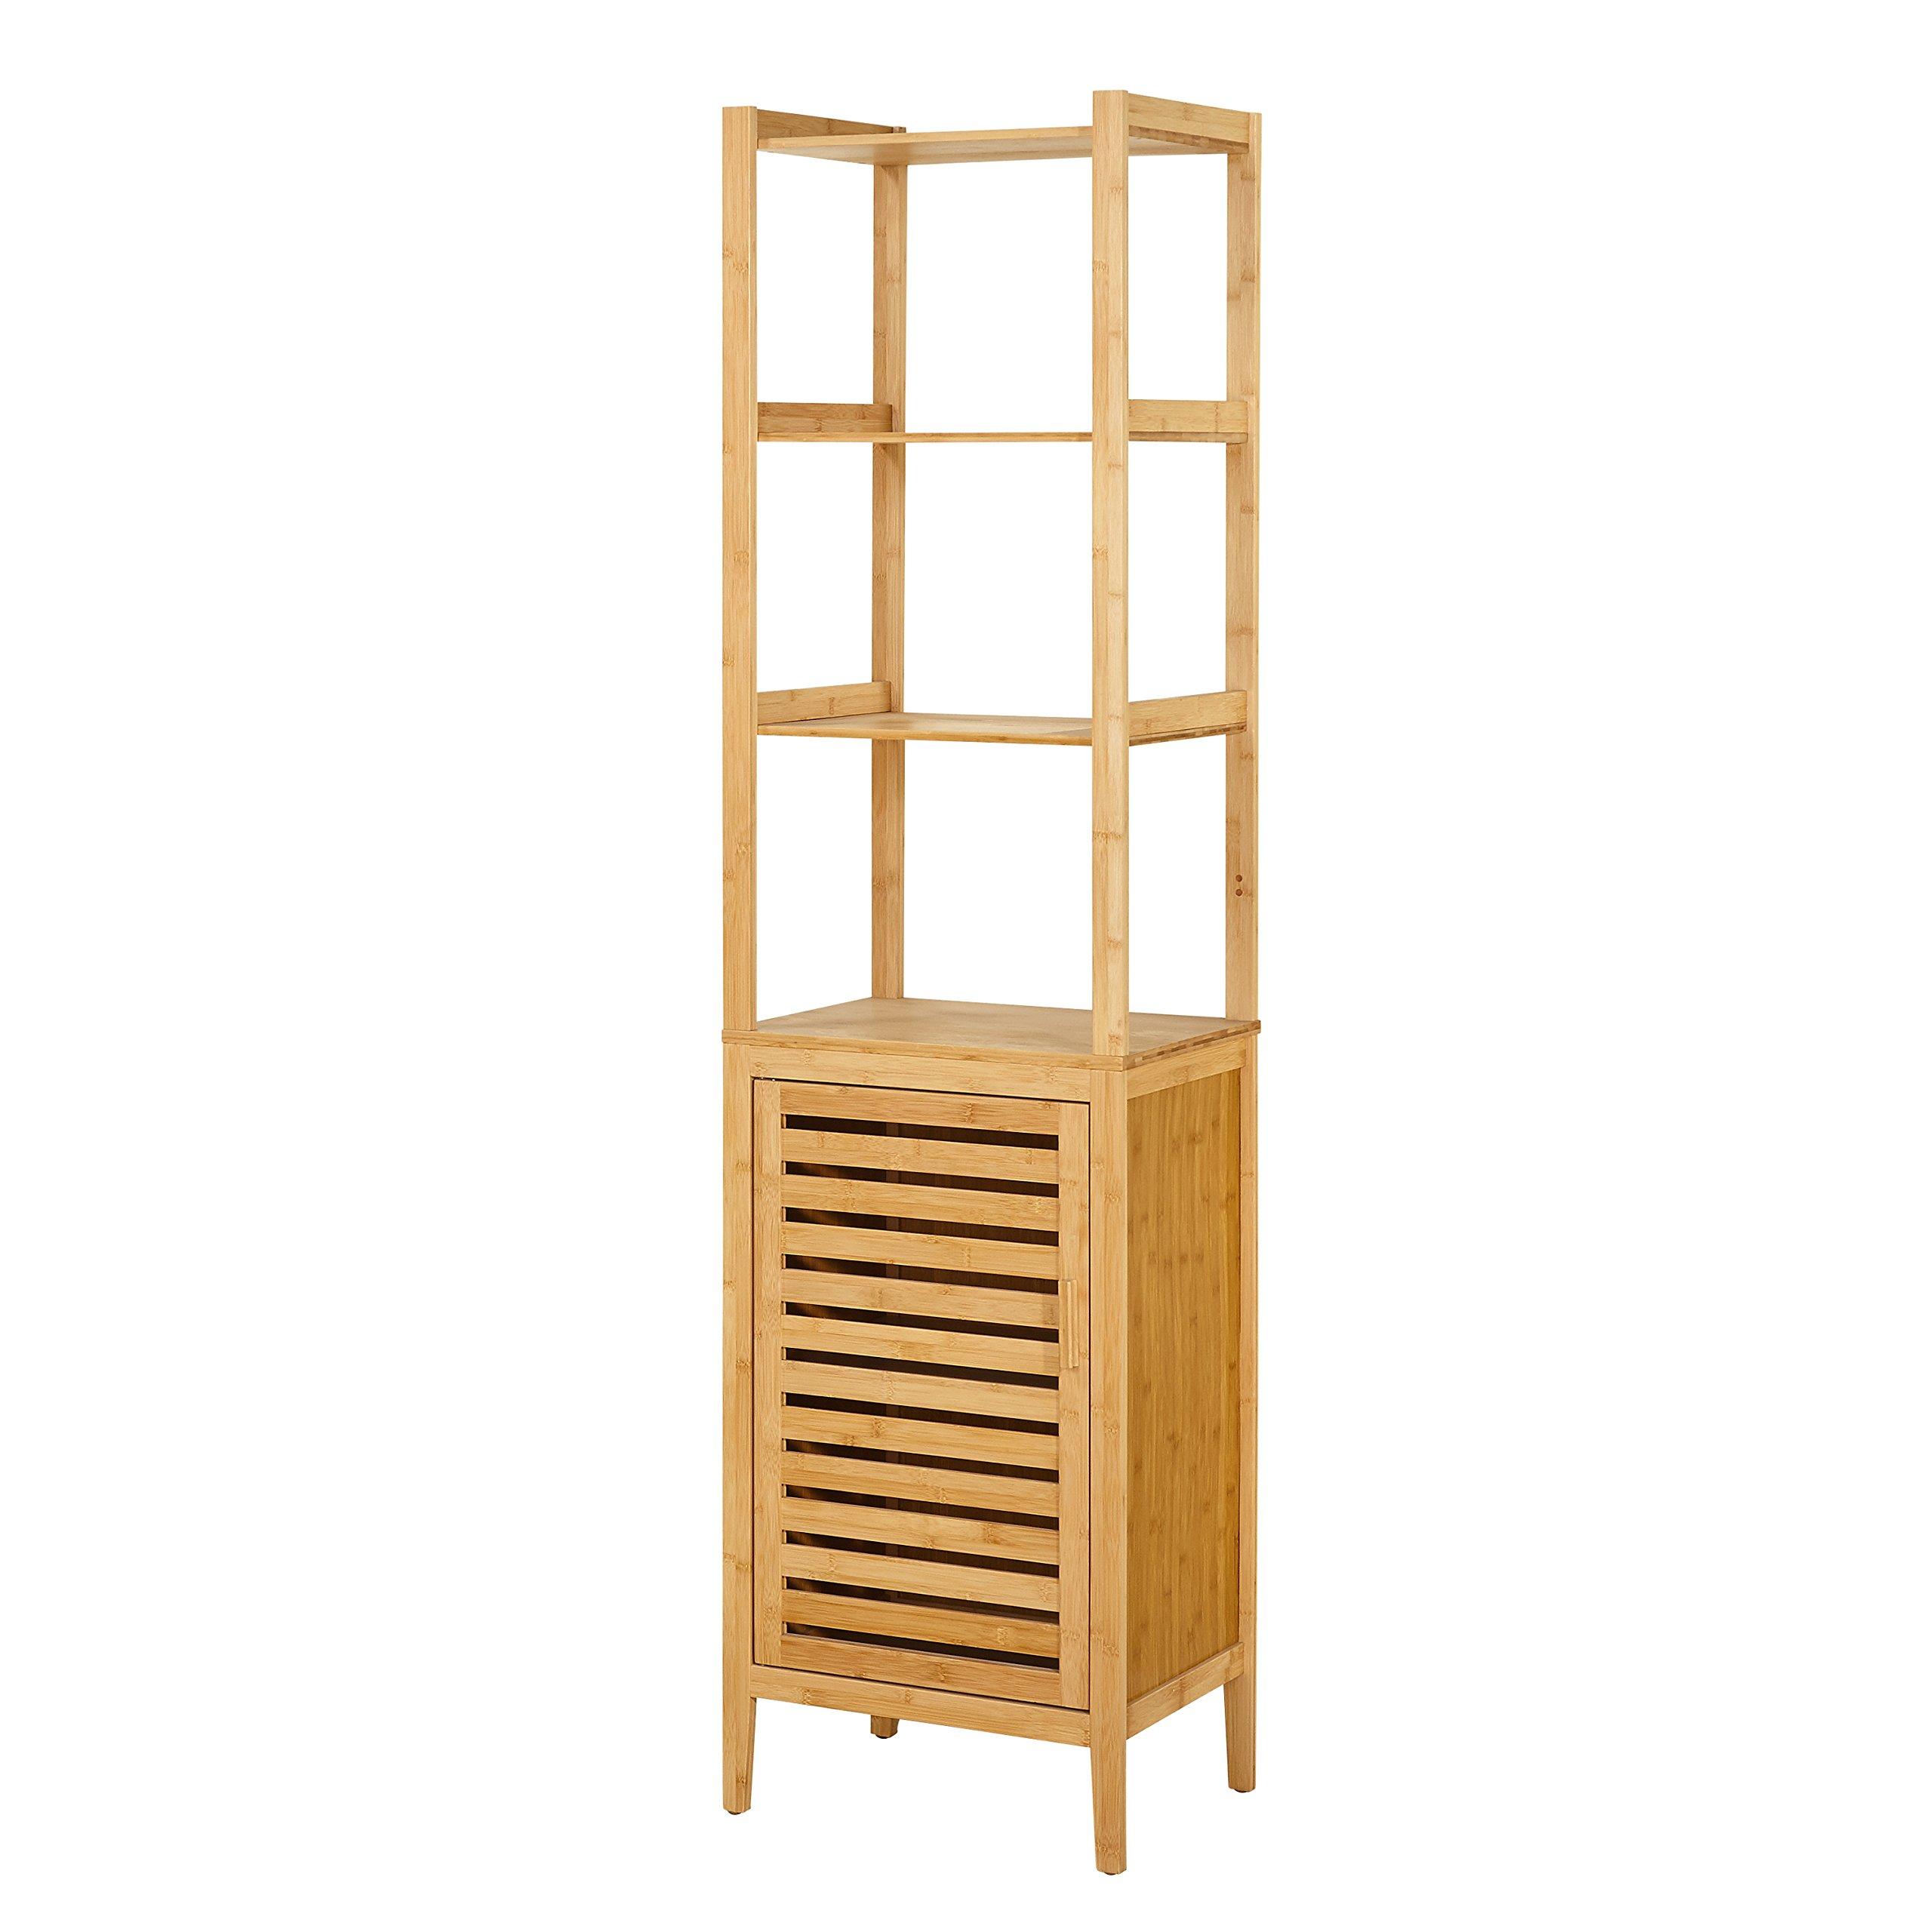 Simple Living Natural Bamboo Linen Tower, Natural Brown